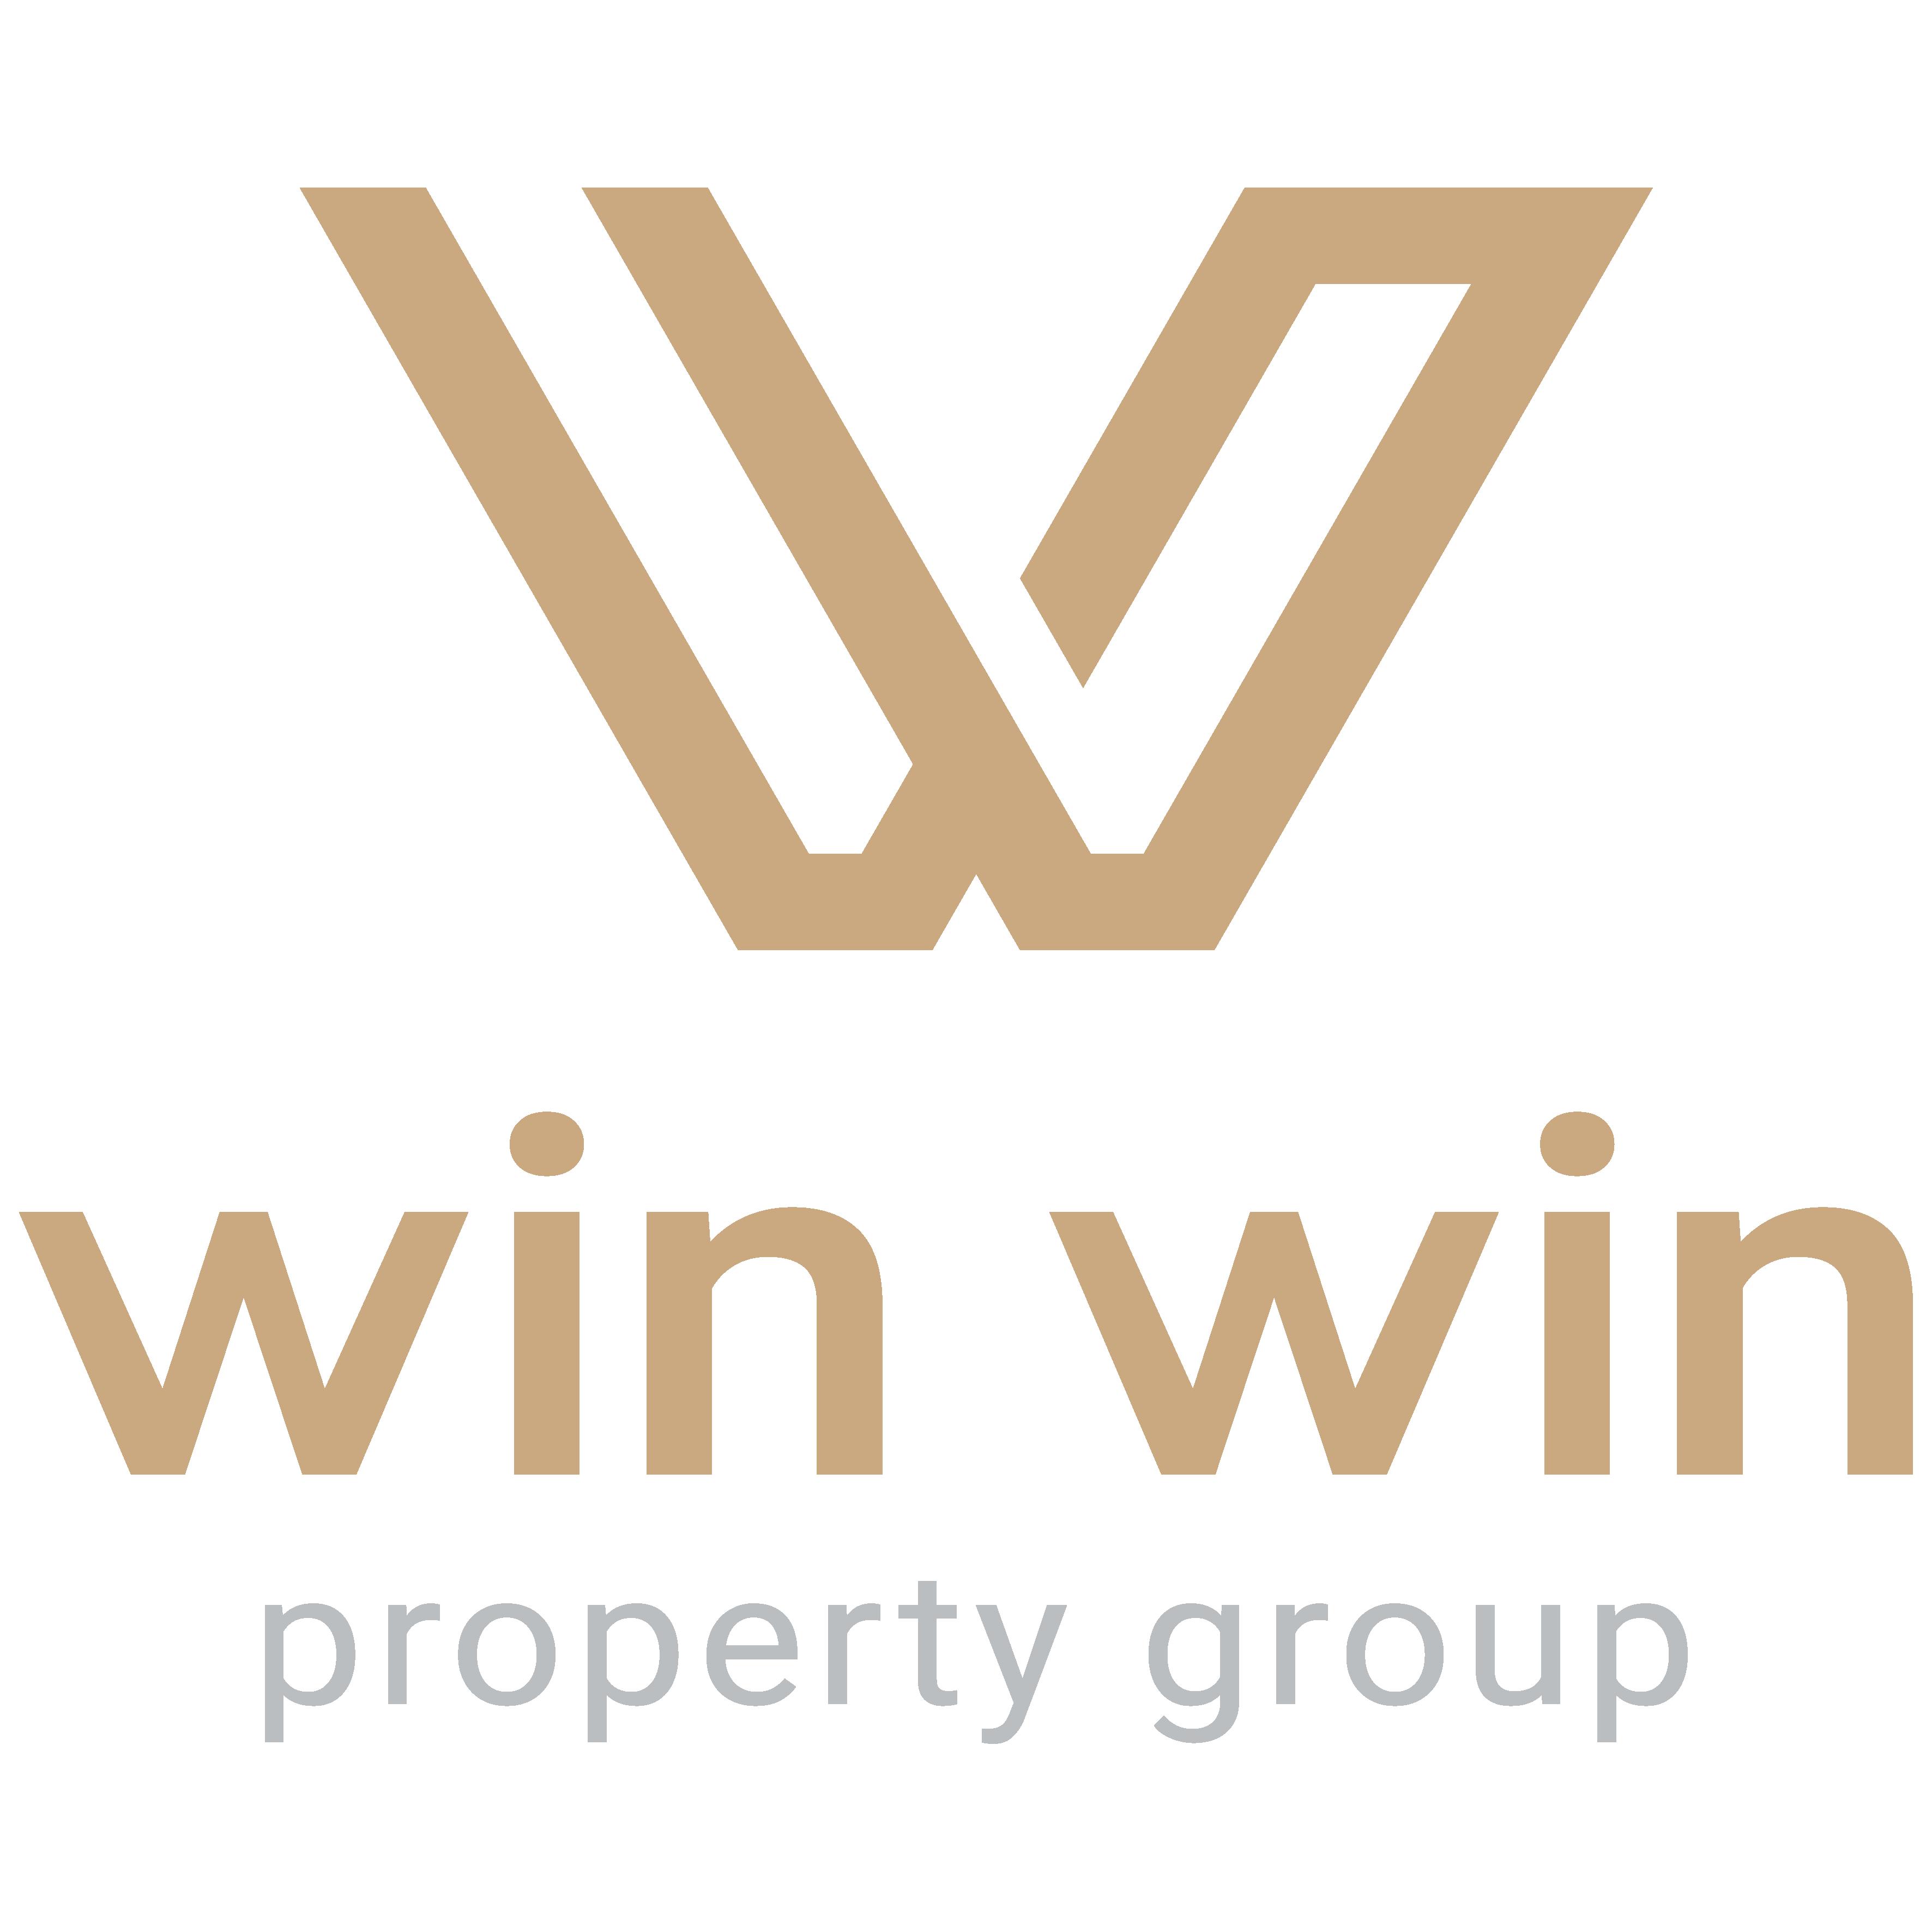 Win Win Property Group logo